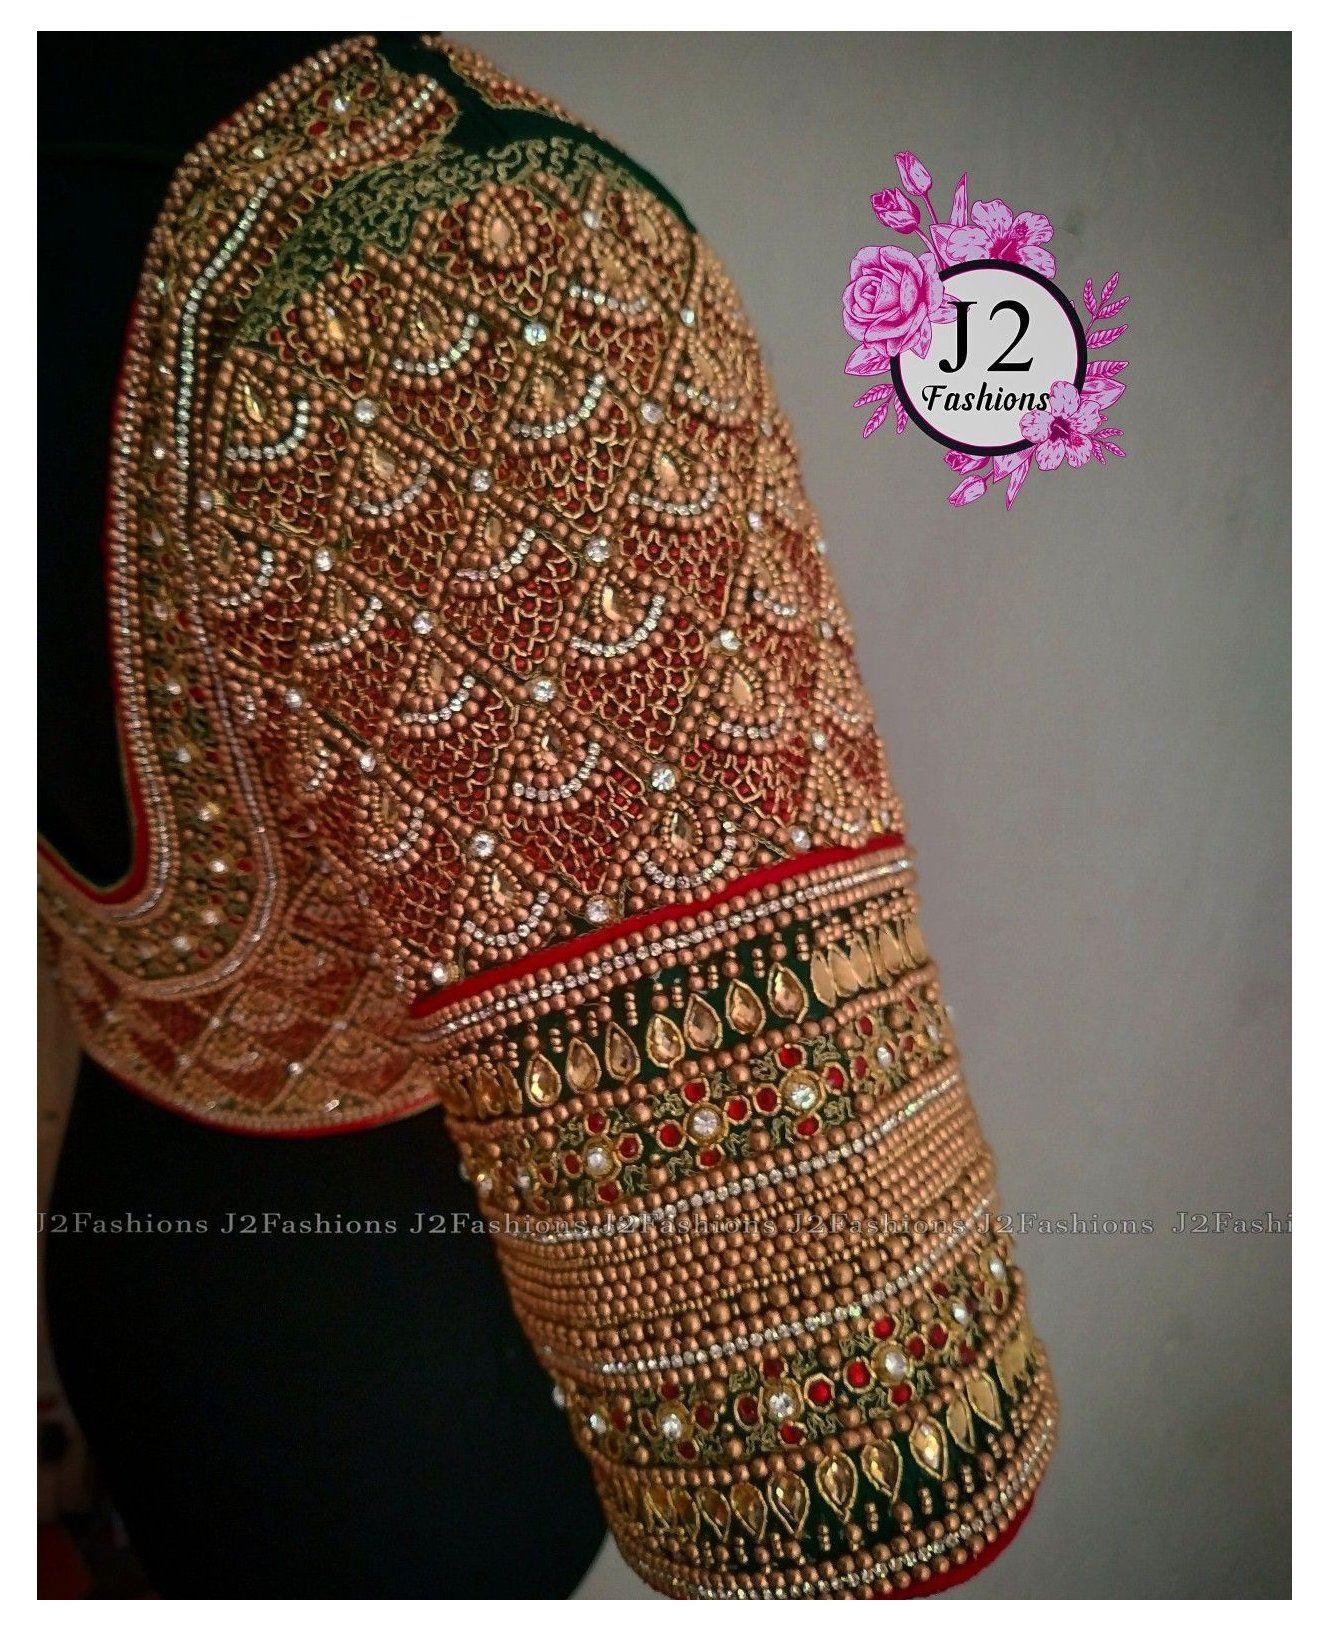 Readymade saree blouse with antique beads aari hand  work Ready to wear women\u2019s sari top size 36\u201d adjustable up to 38\u201d